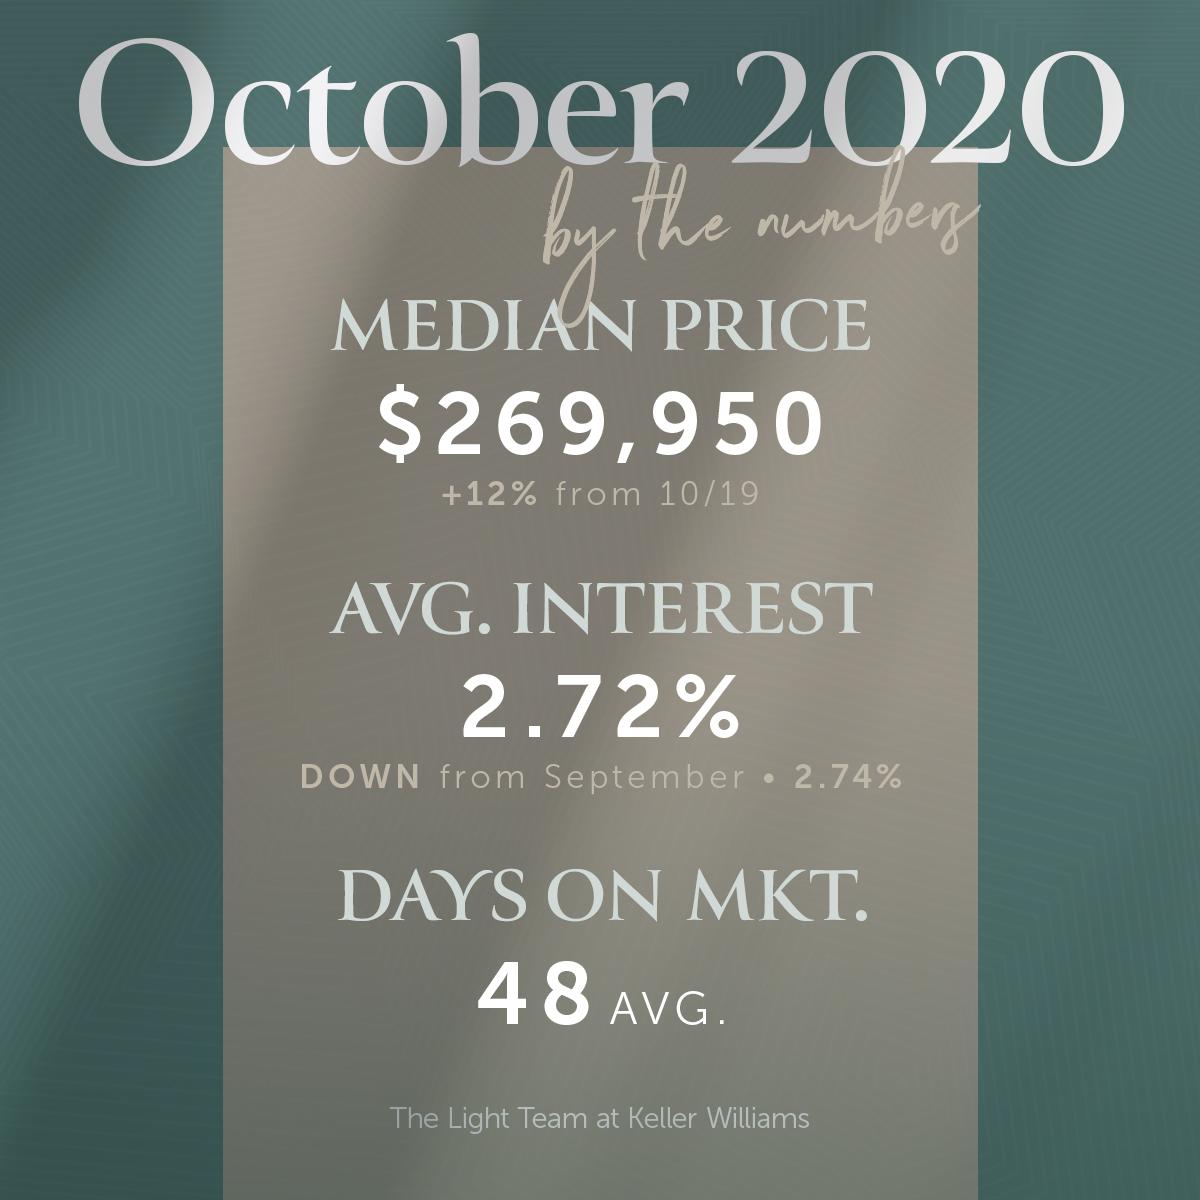 Orlando Real Estate Market Recap for October 2020